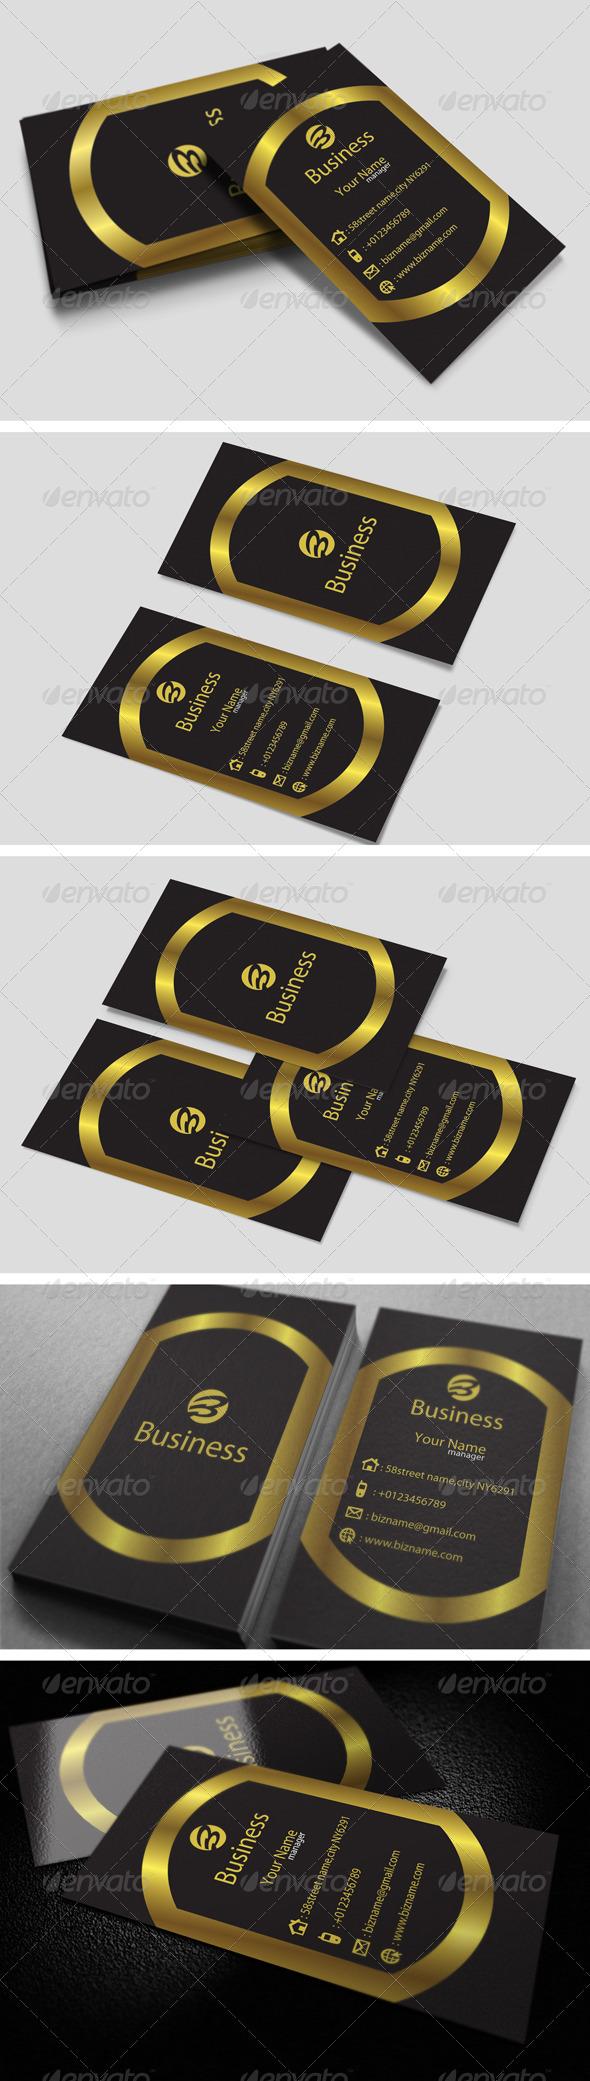 GraphicRiver Innovative Card 5710413